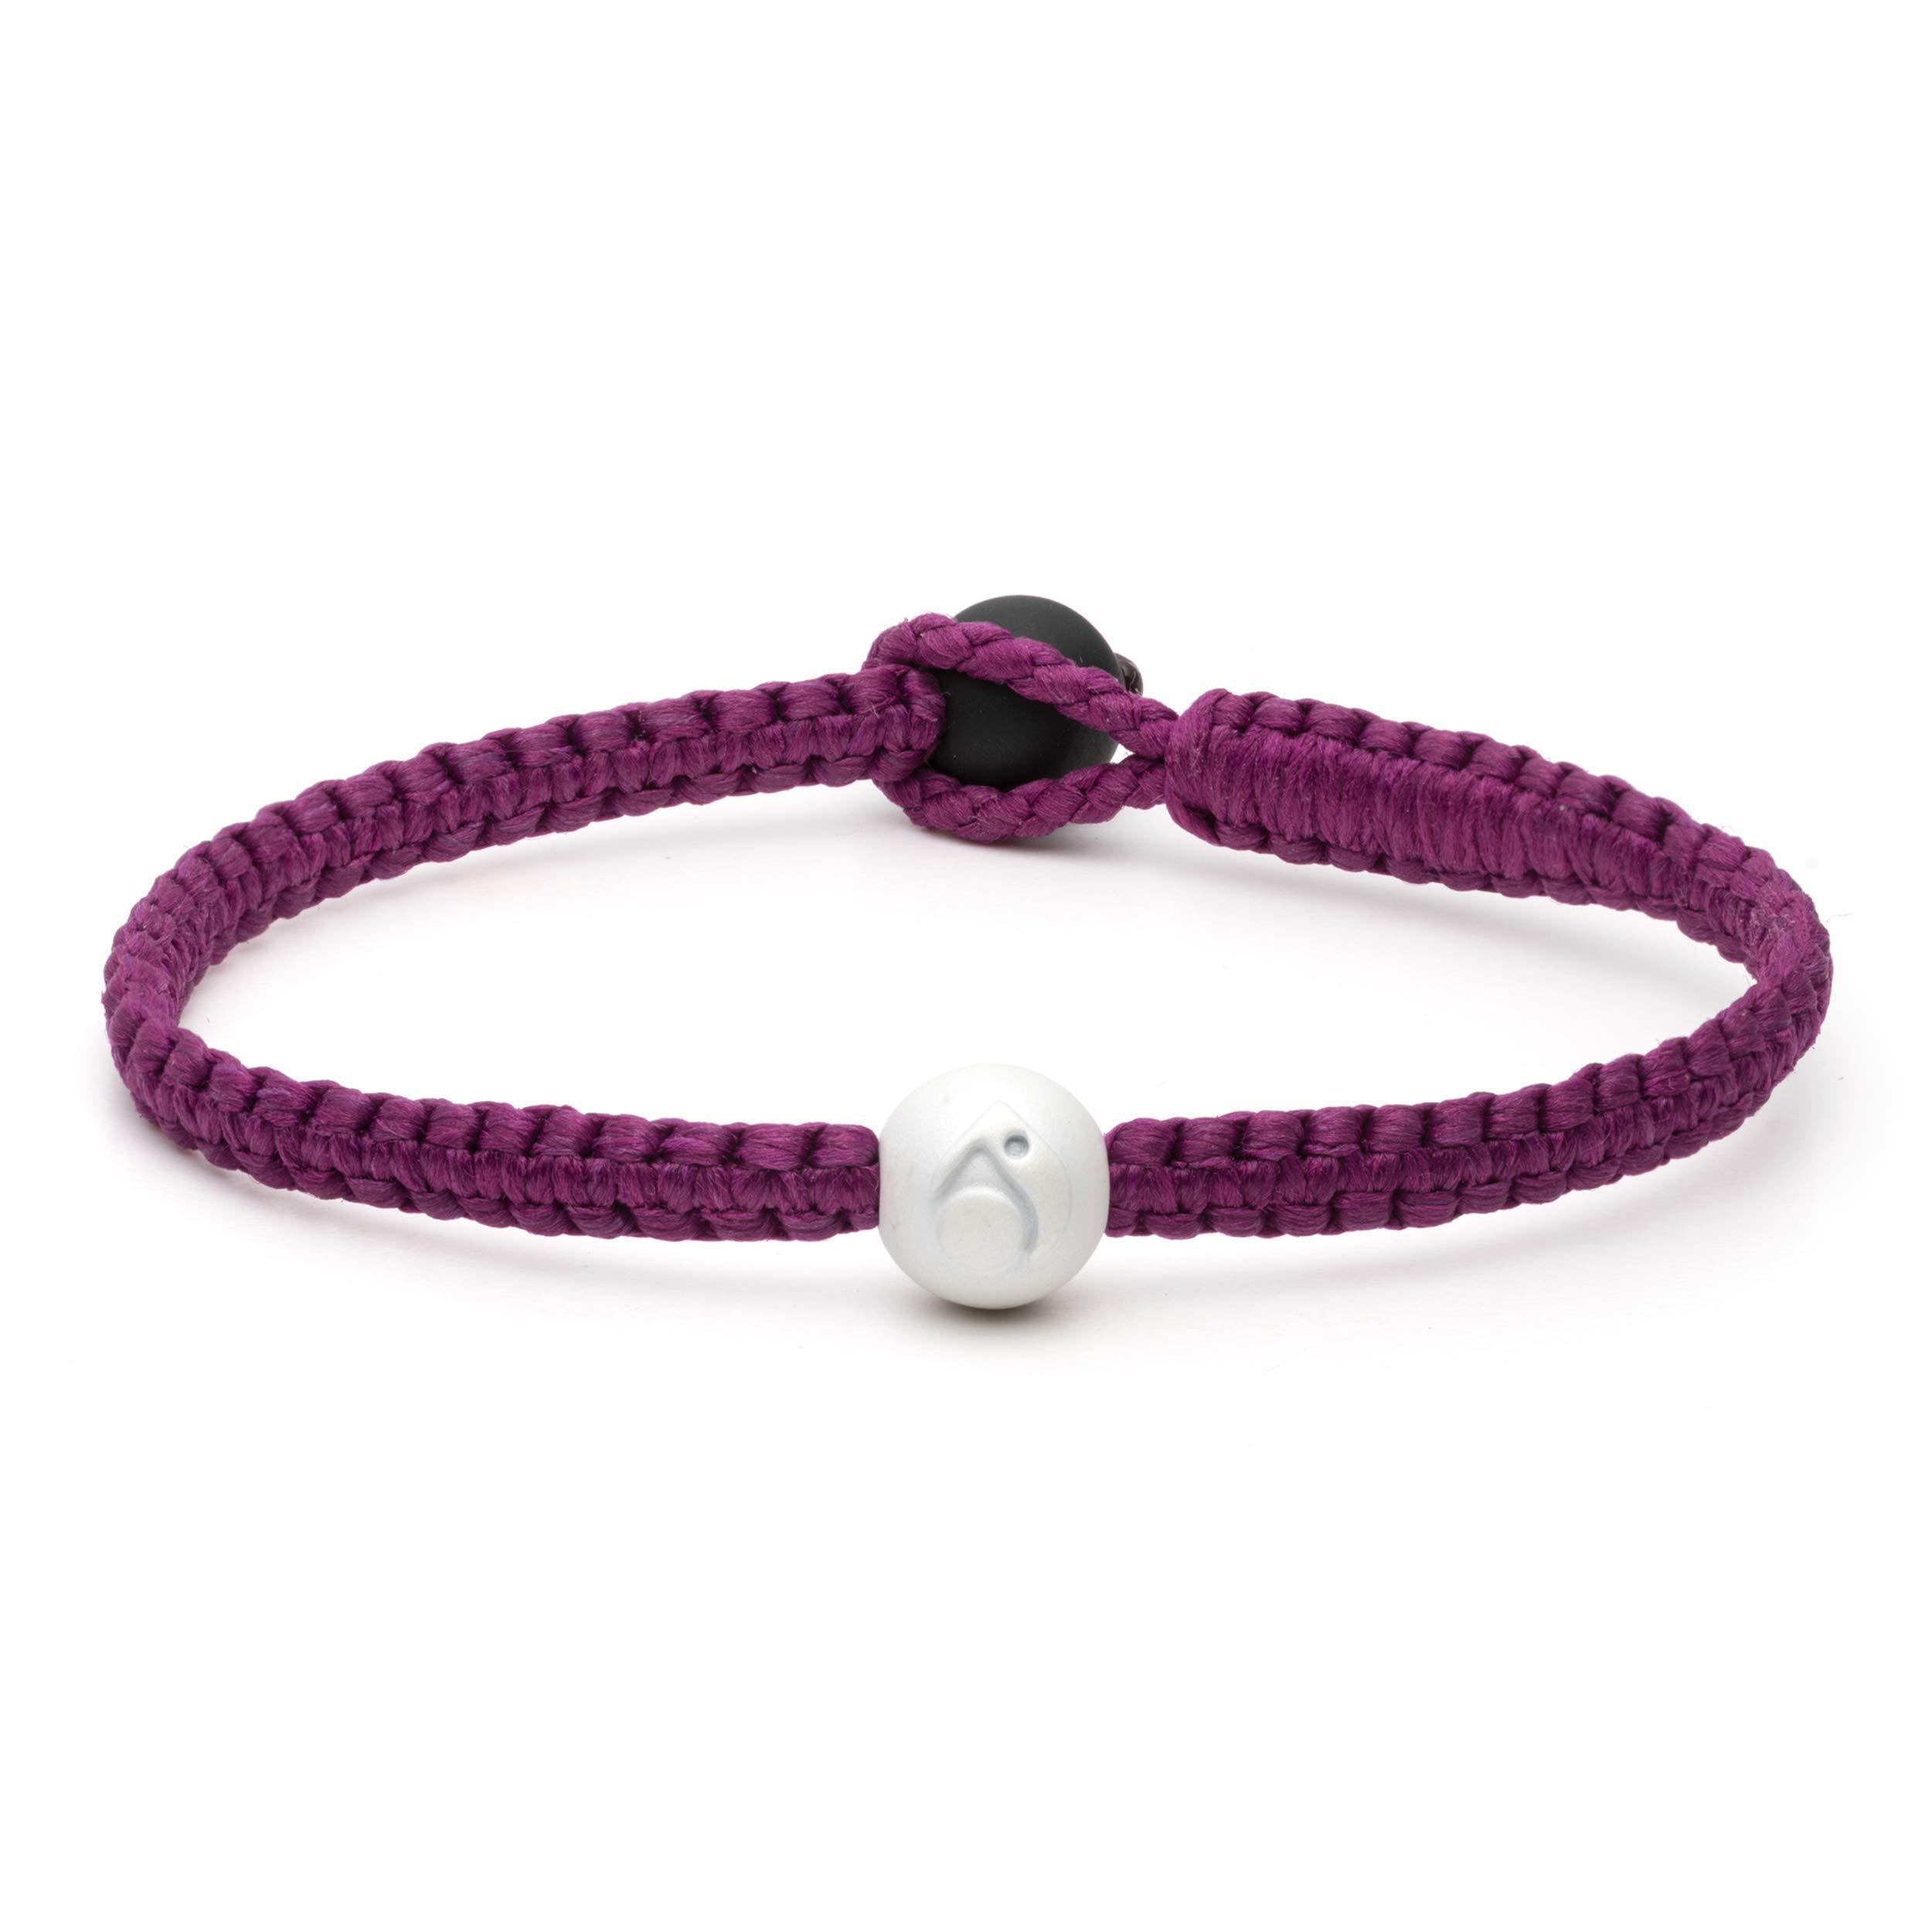 Lokai Single Wrap Bracelet